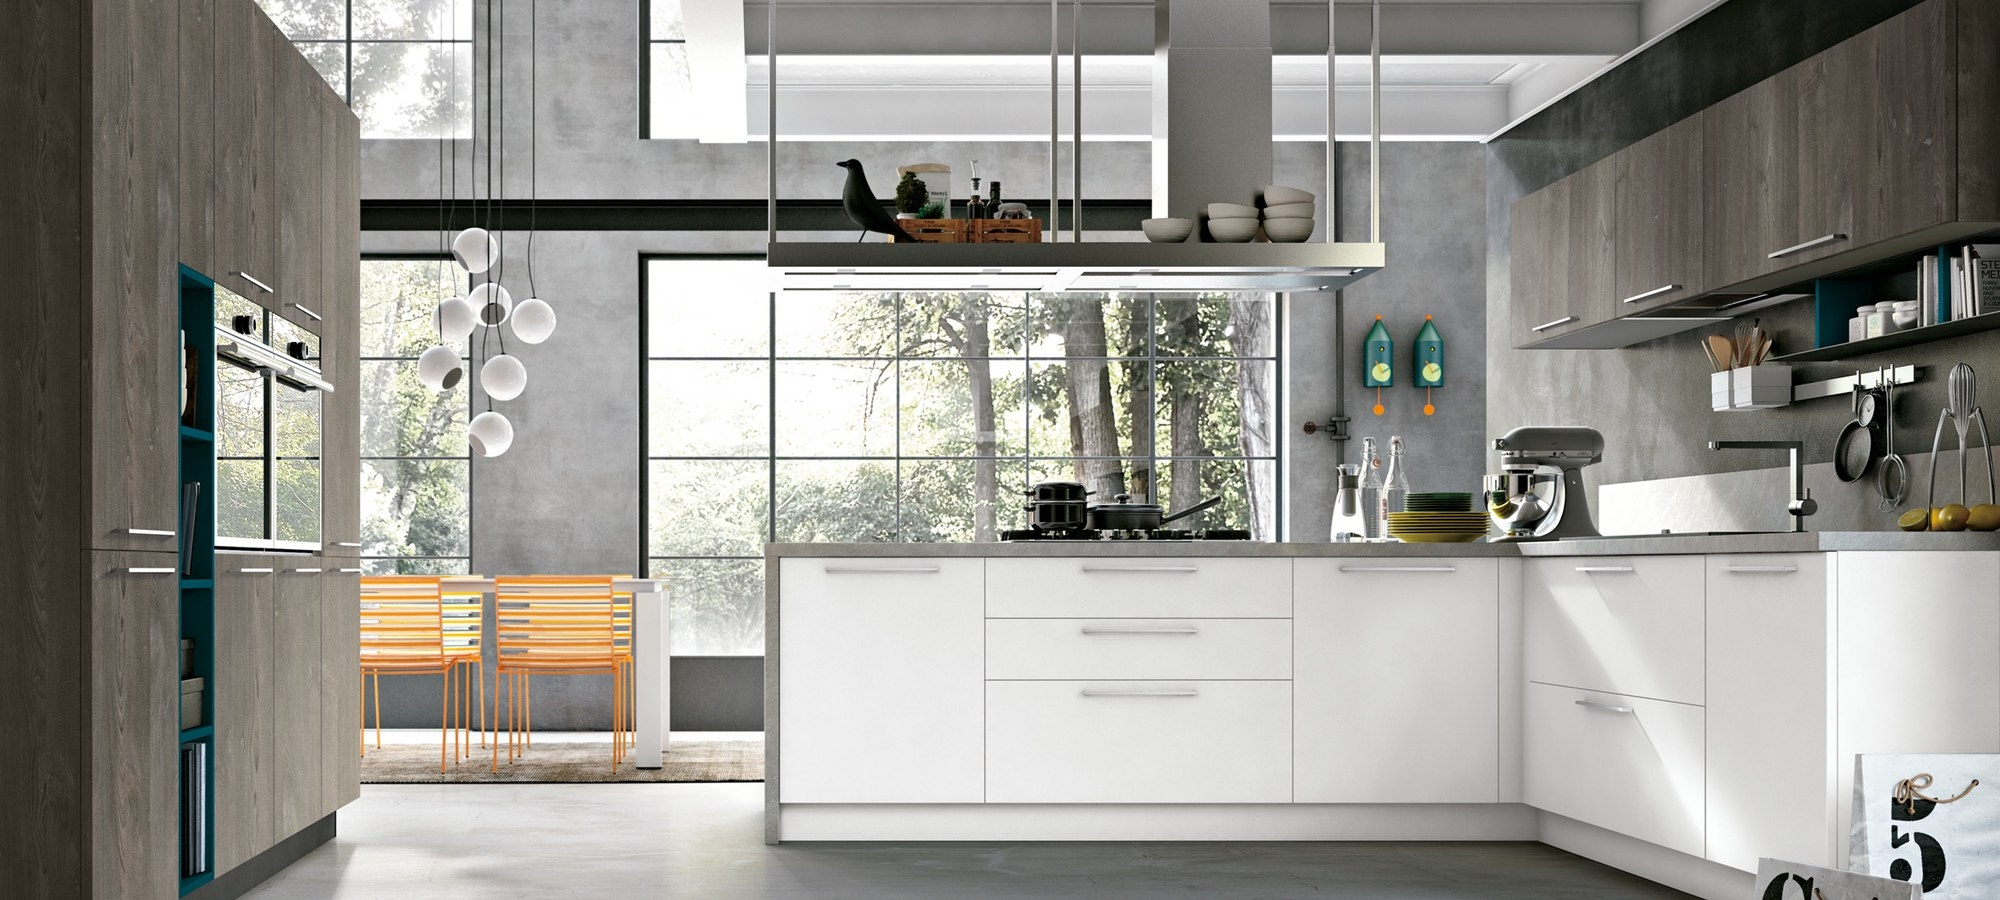 Emejing Stosa Cucine Genova Pictures - Ideas & Design 2017 ...